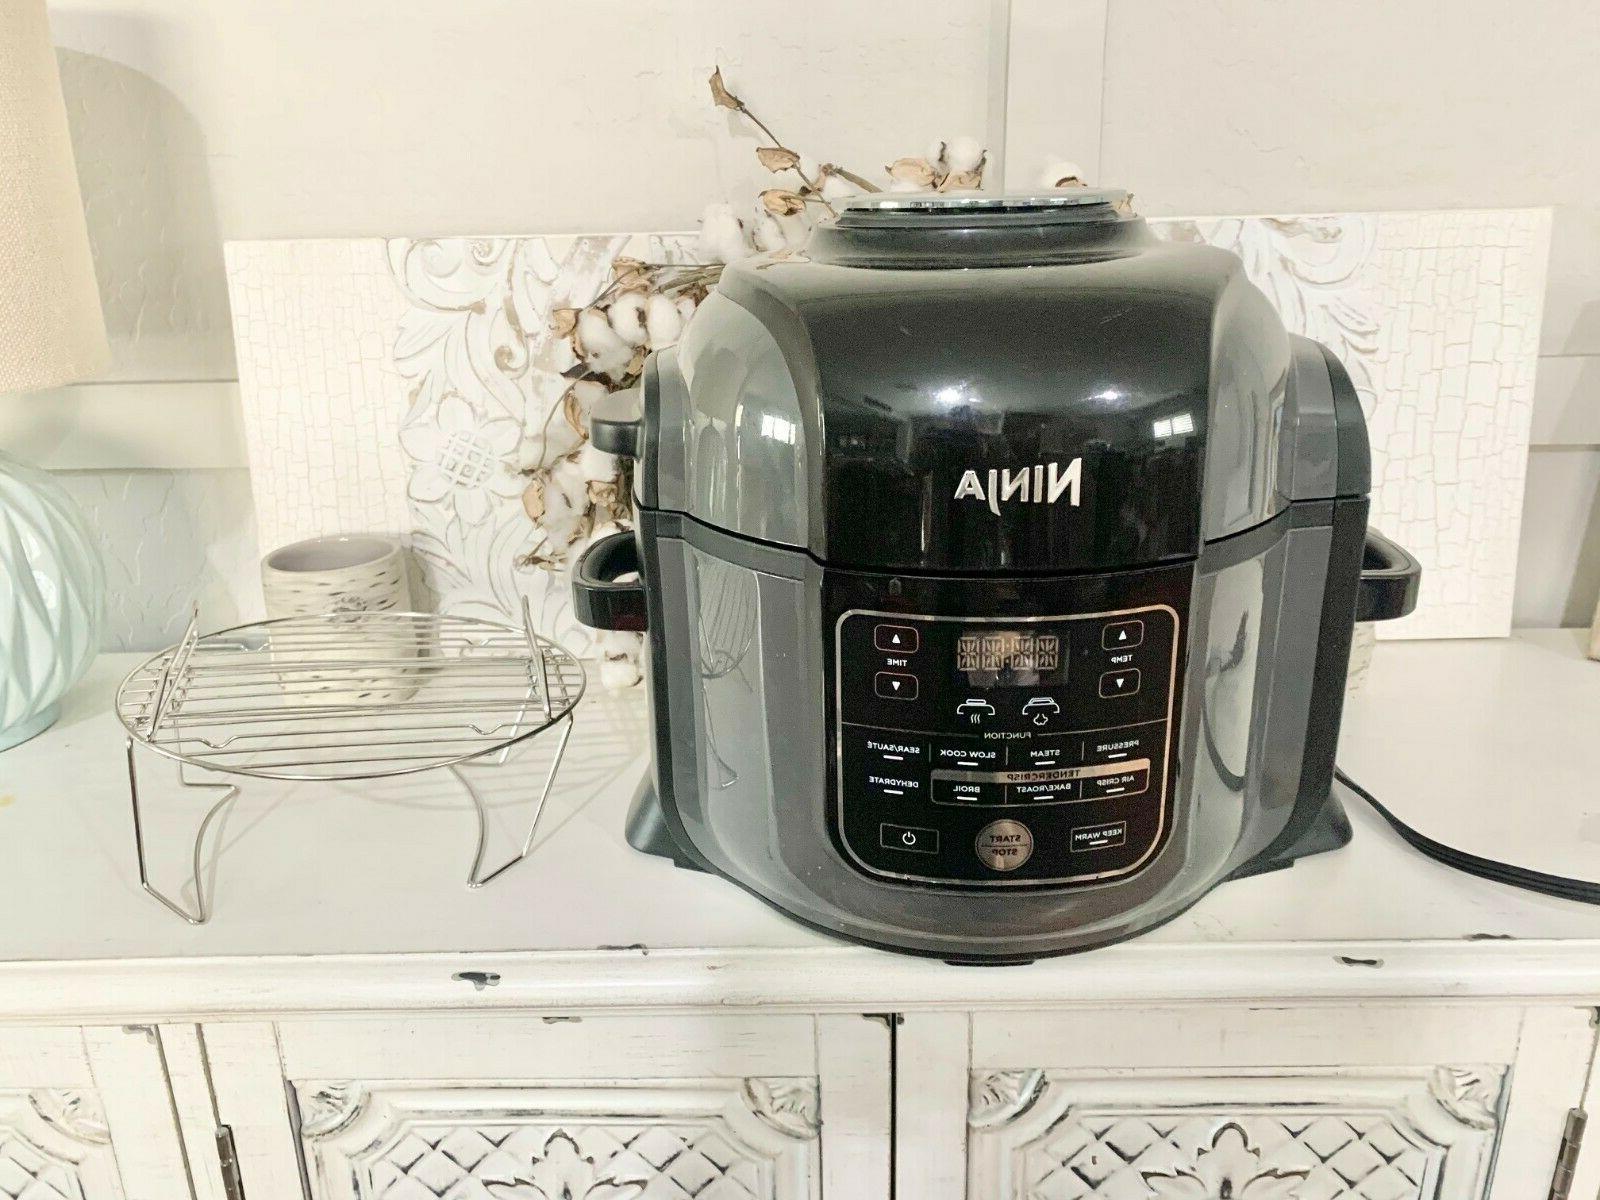 foodi op302 programmable pressure cooker